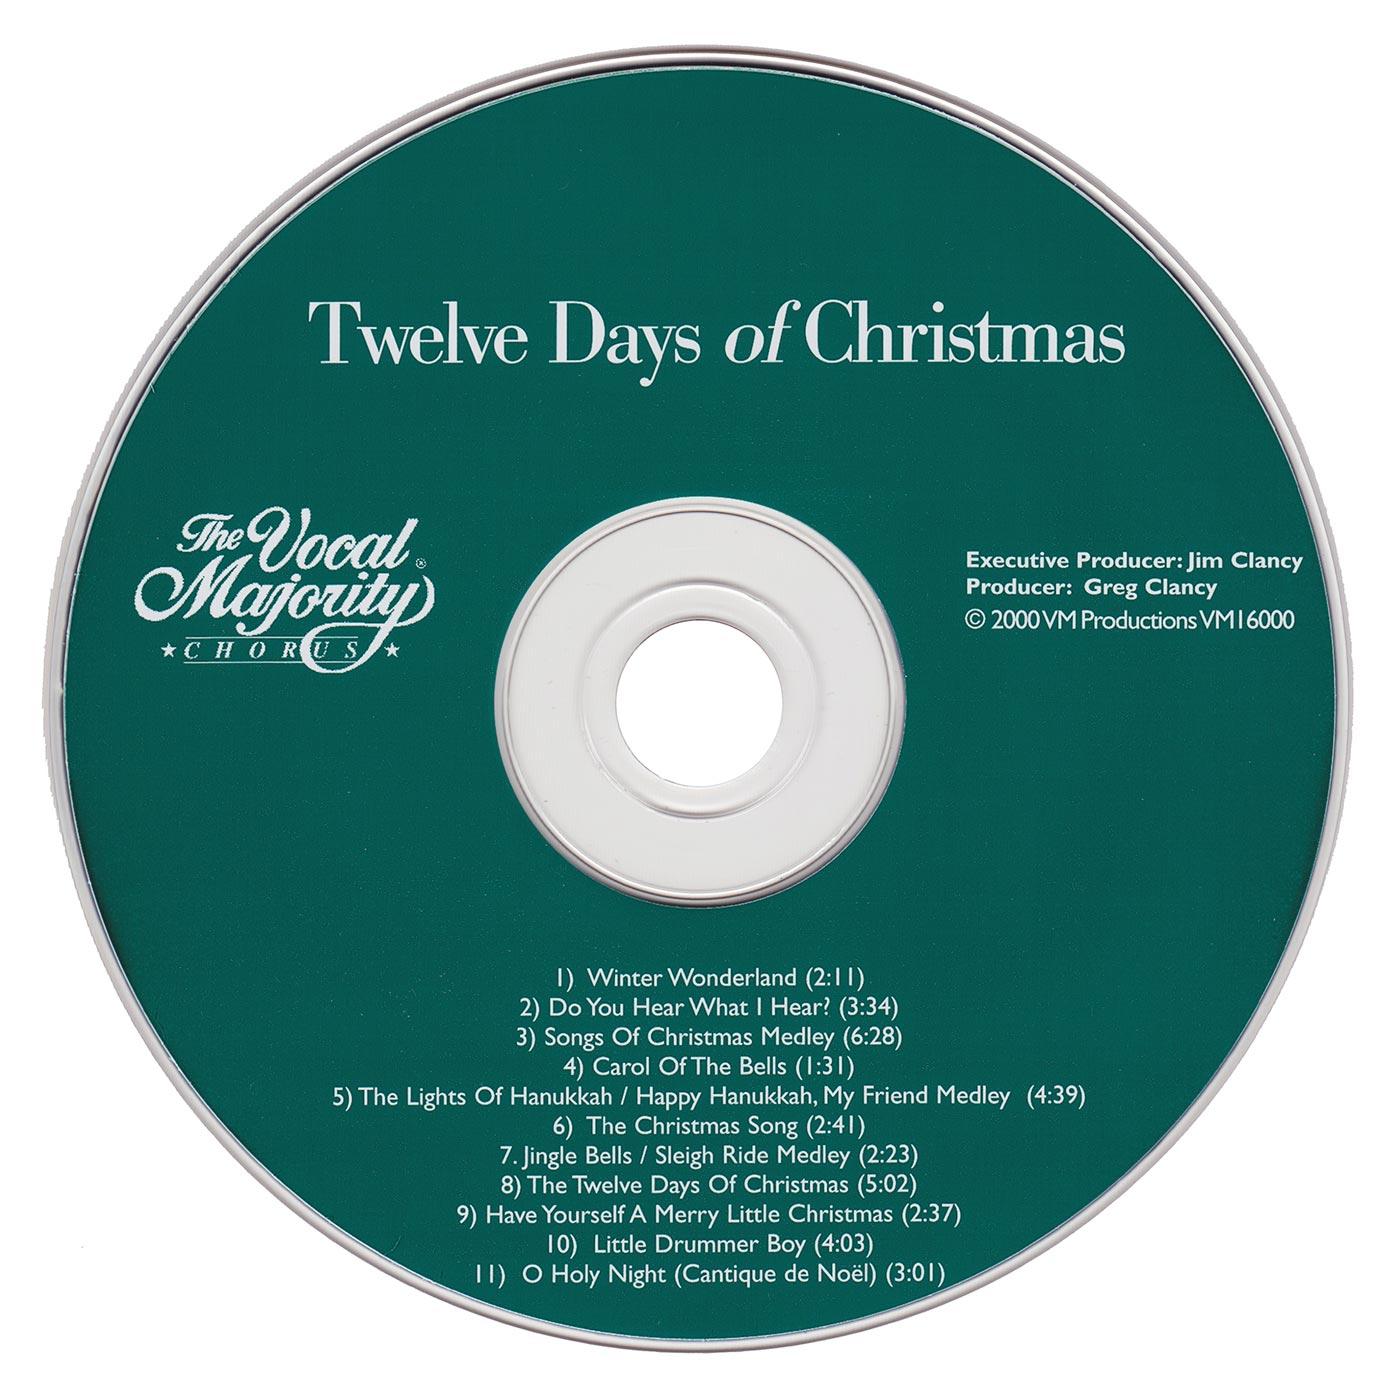 Disc Art: Twelve Days of Christmas